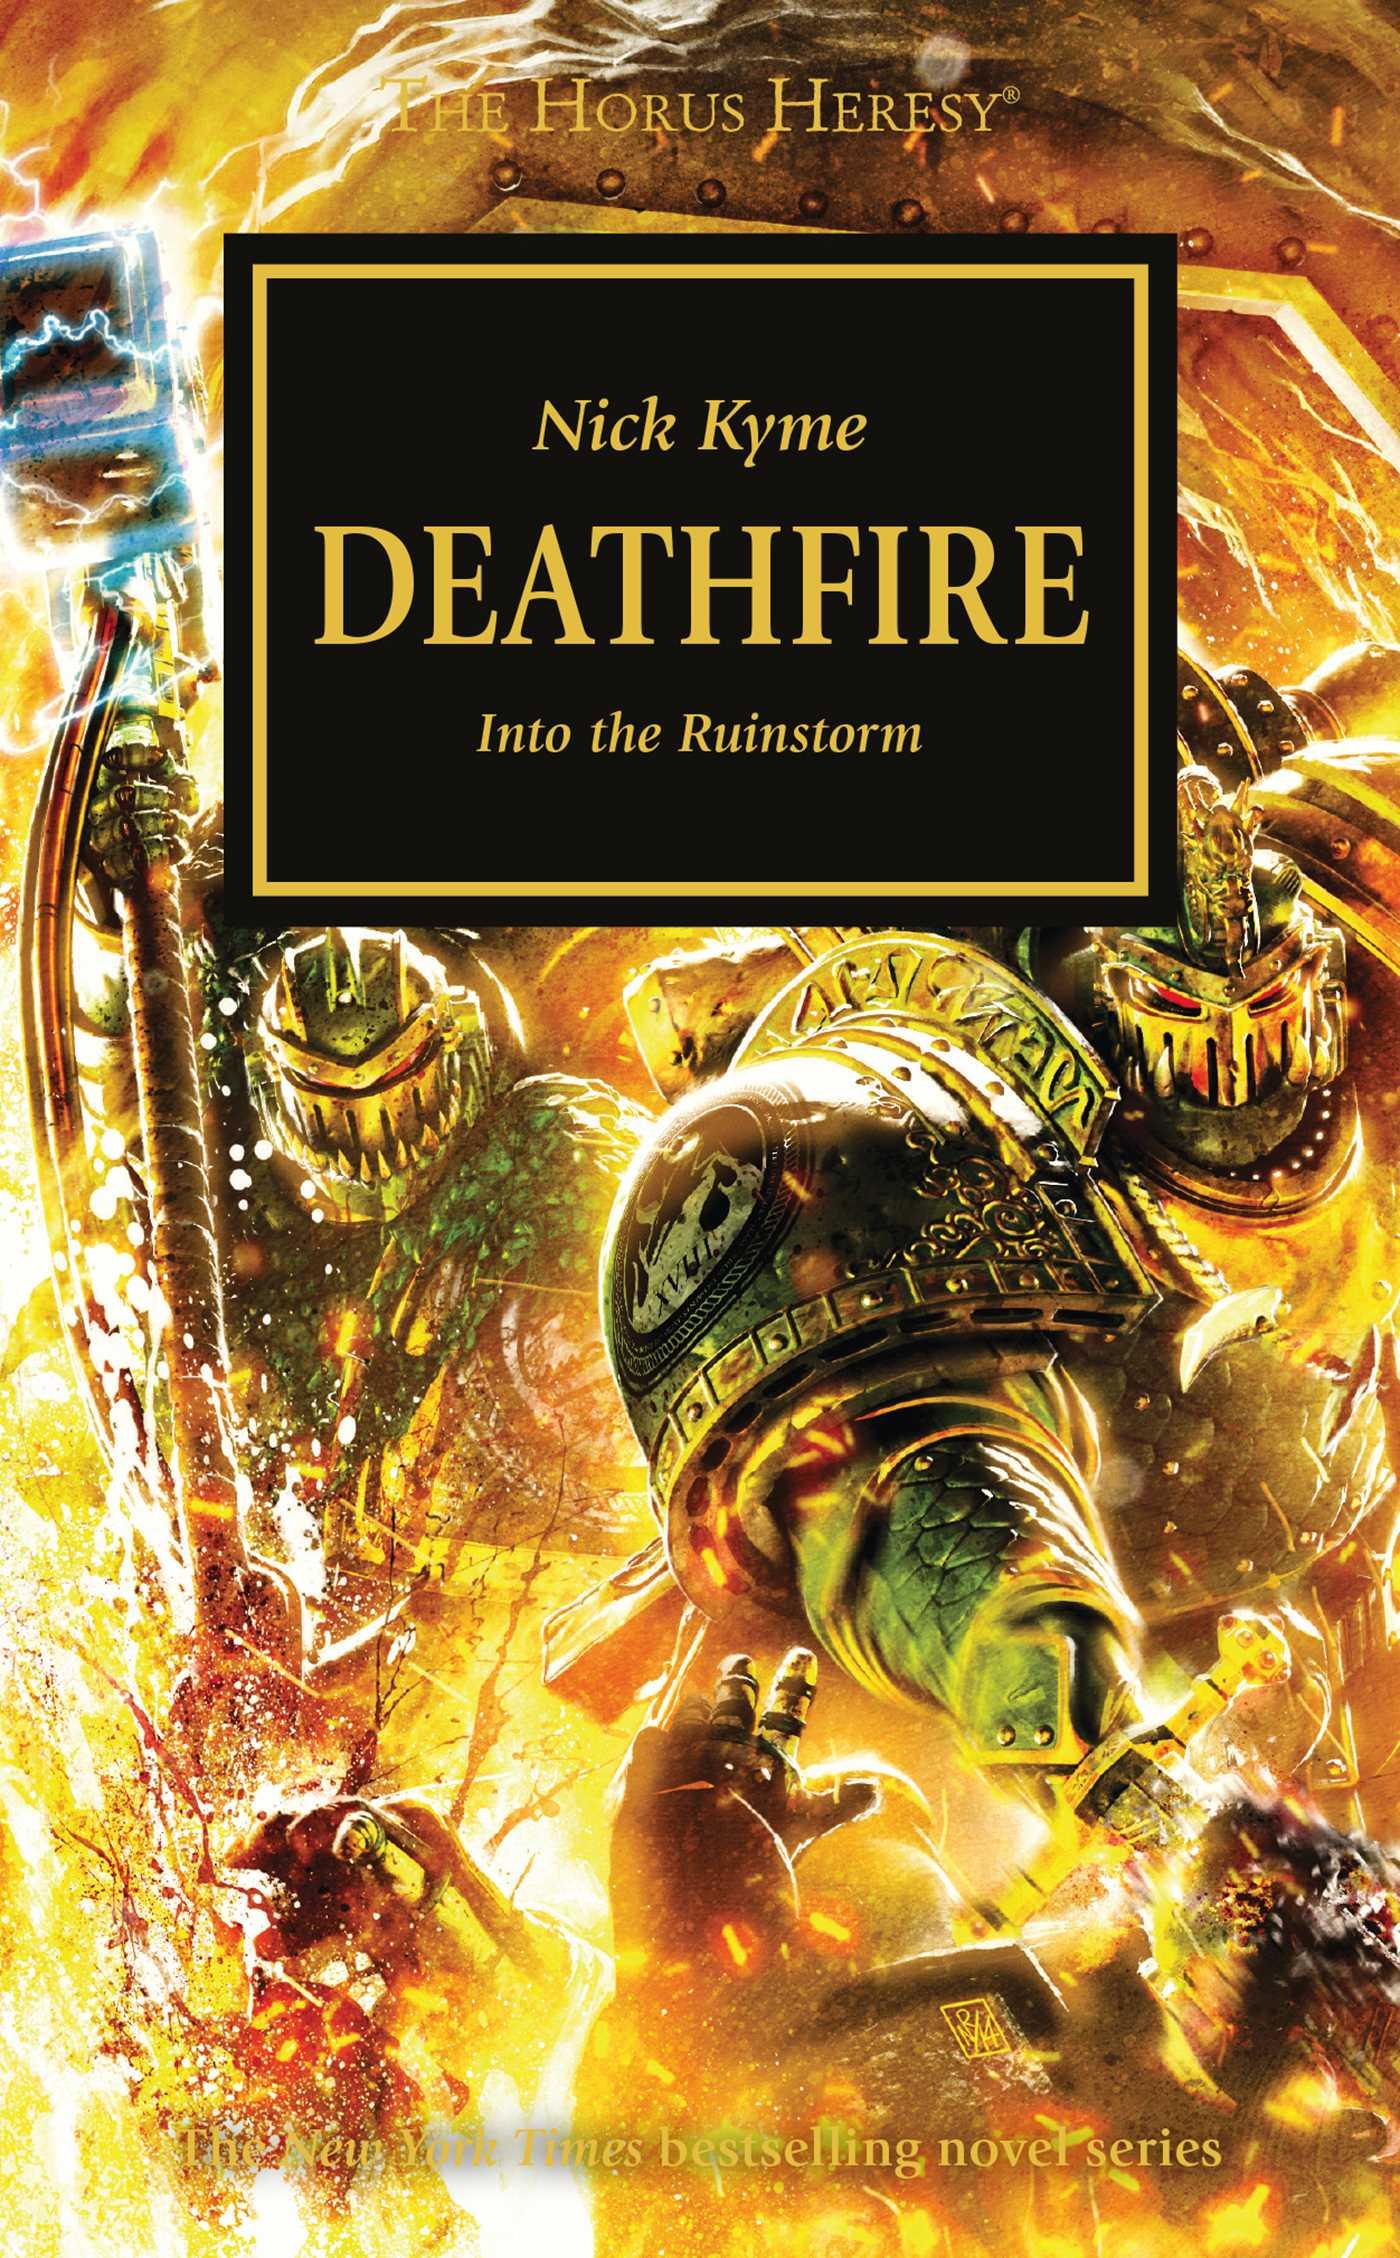 Deathfire 9781784961565 hr